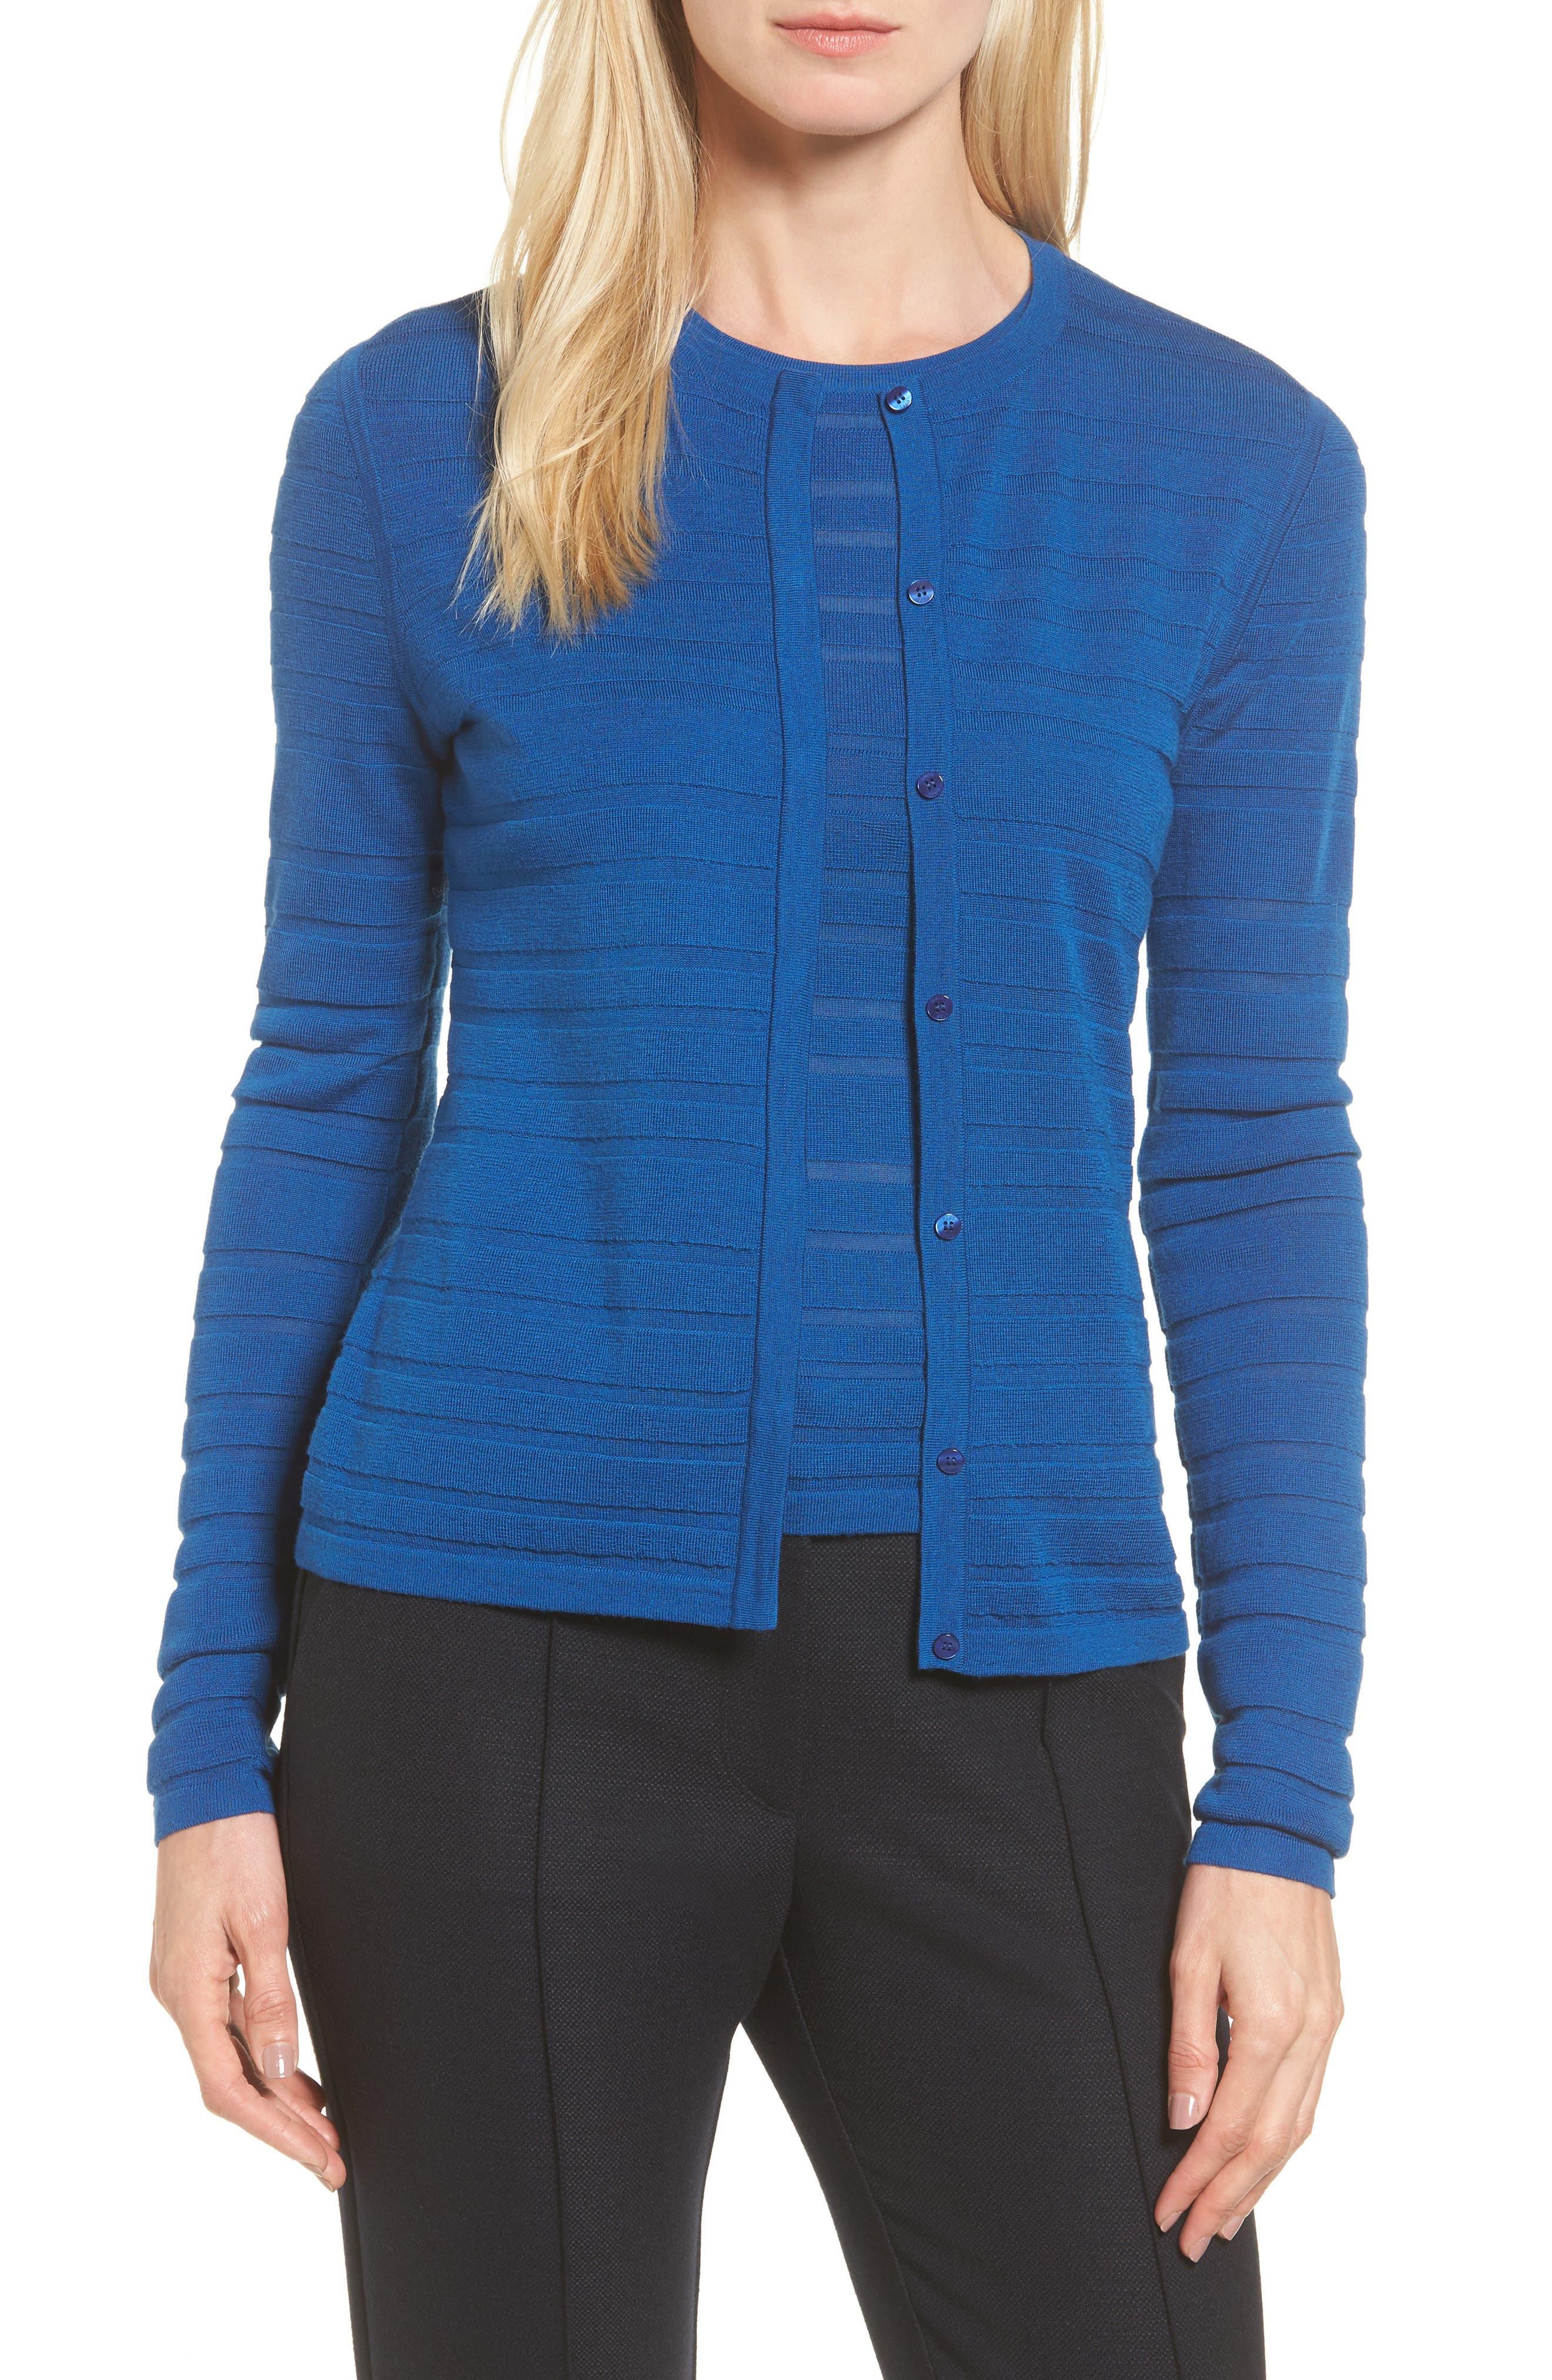 Fahsa Stripe Textured Wool Cardigan,                         Main,                         color, Gentian Blue